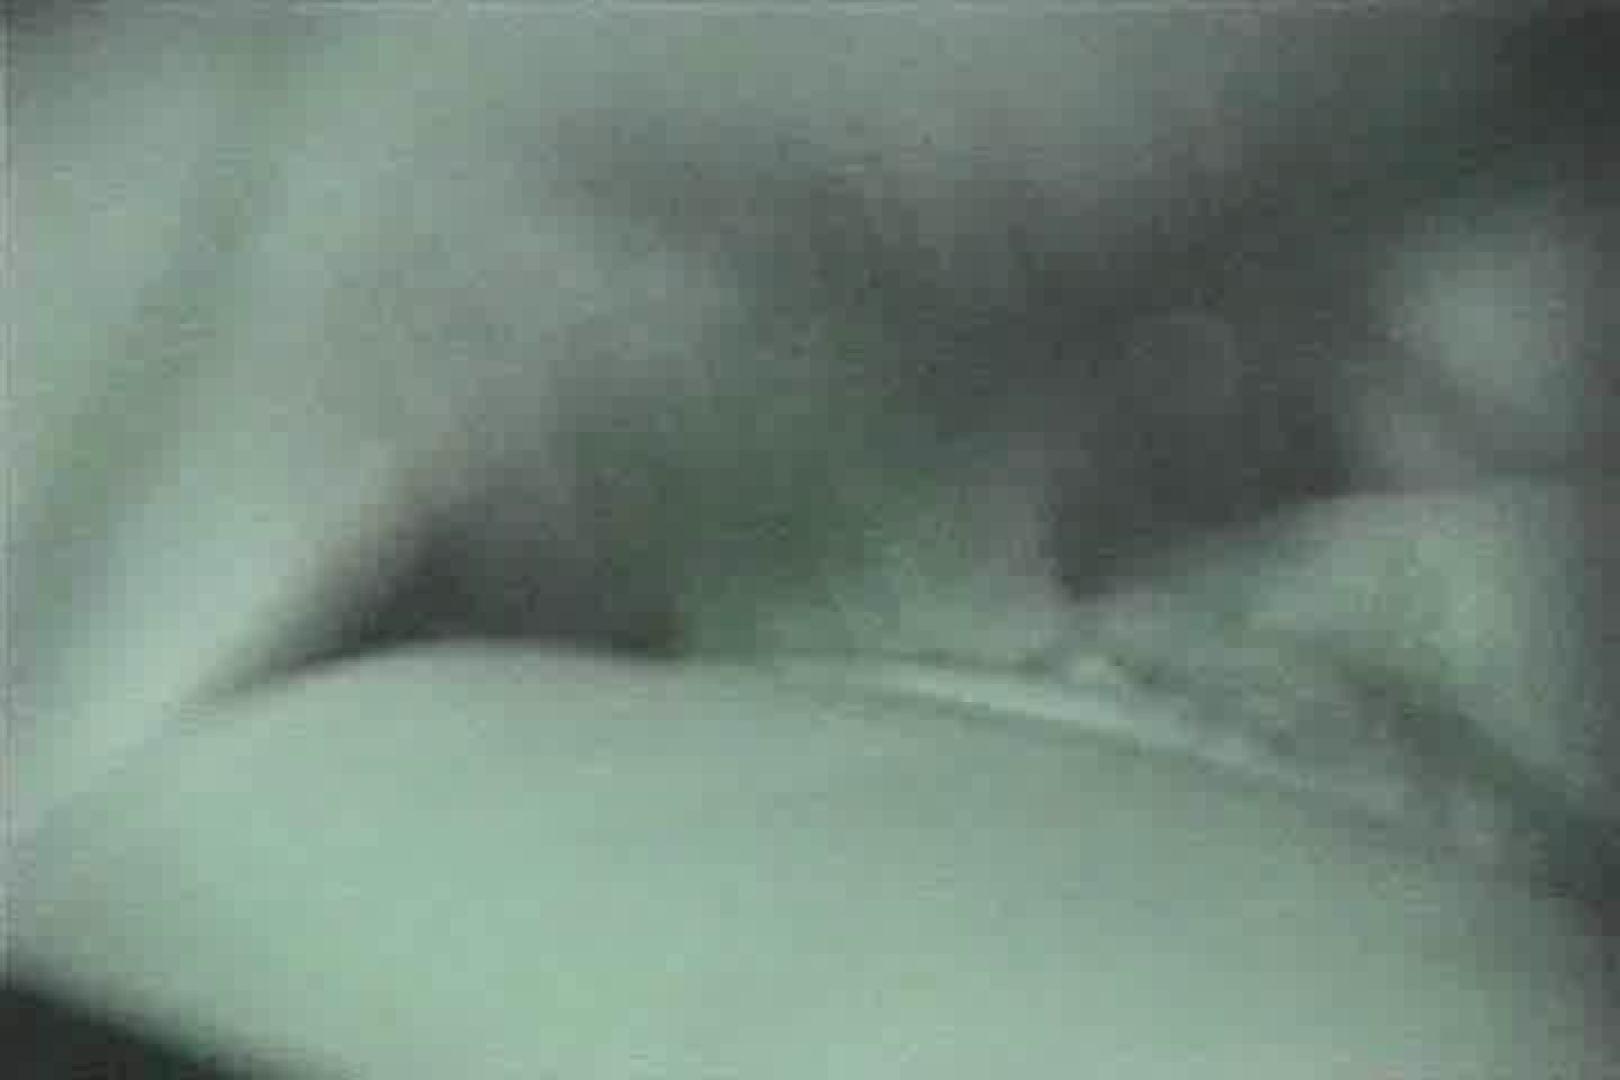 MASAさんの待ち伏せ撮り! 赤外線カーセックスVol.13 ギャルの実態 のぞき濡れ場動画紹介 18pic 9